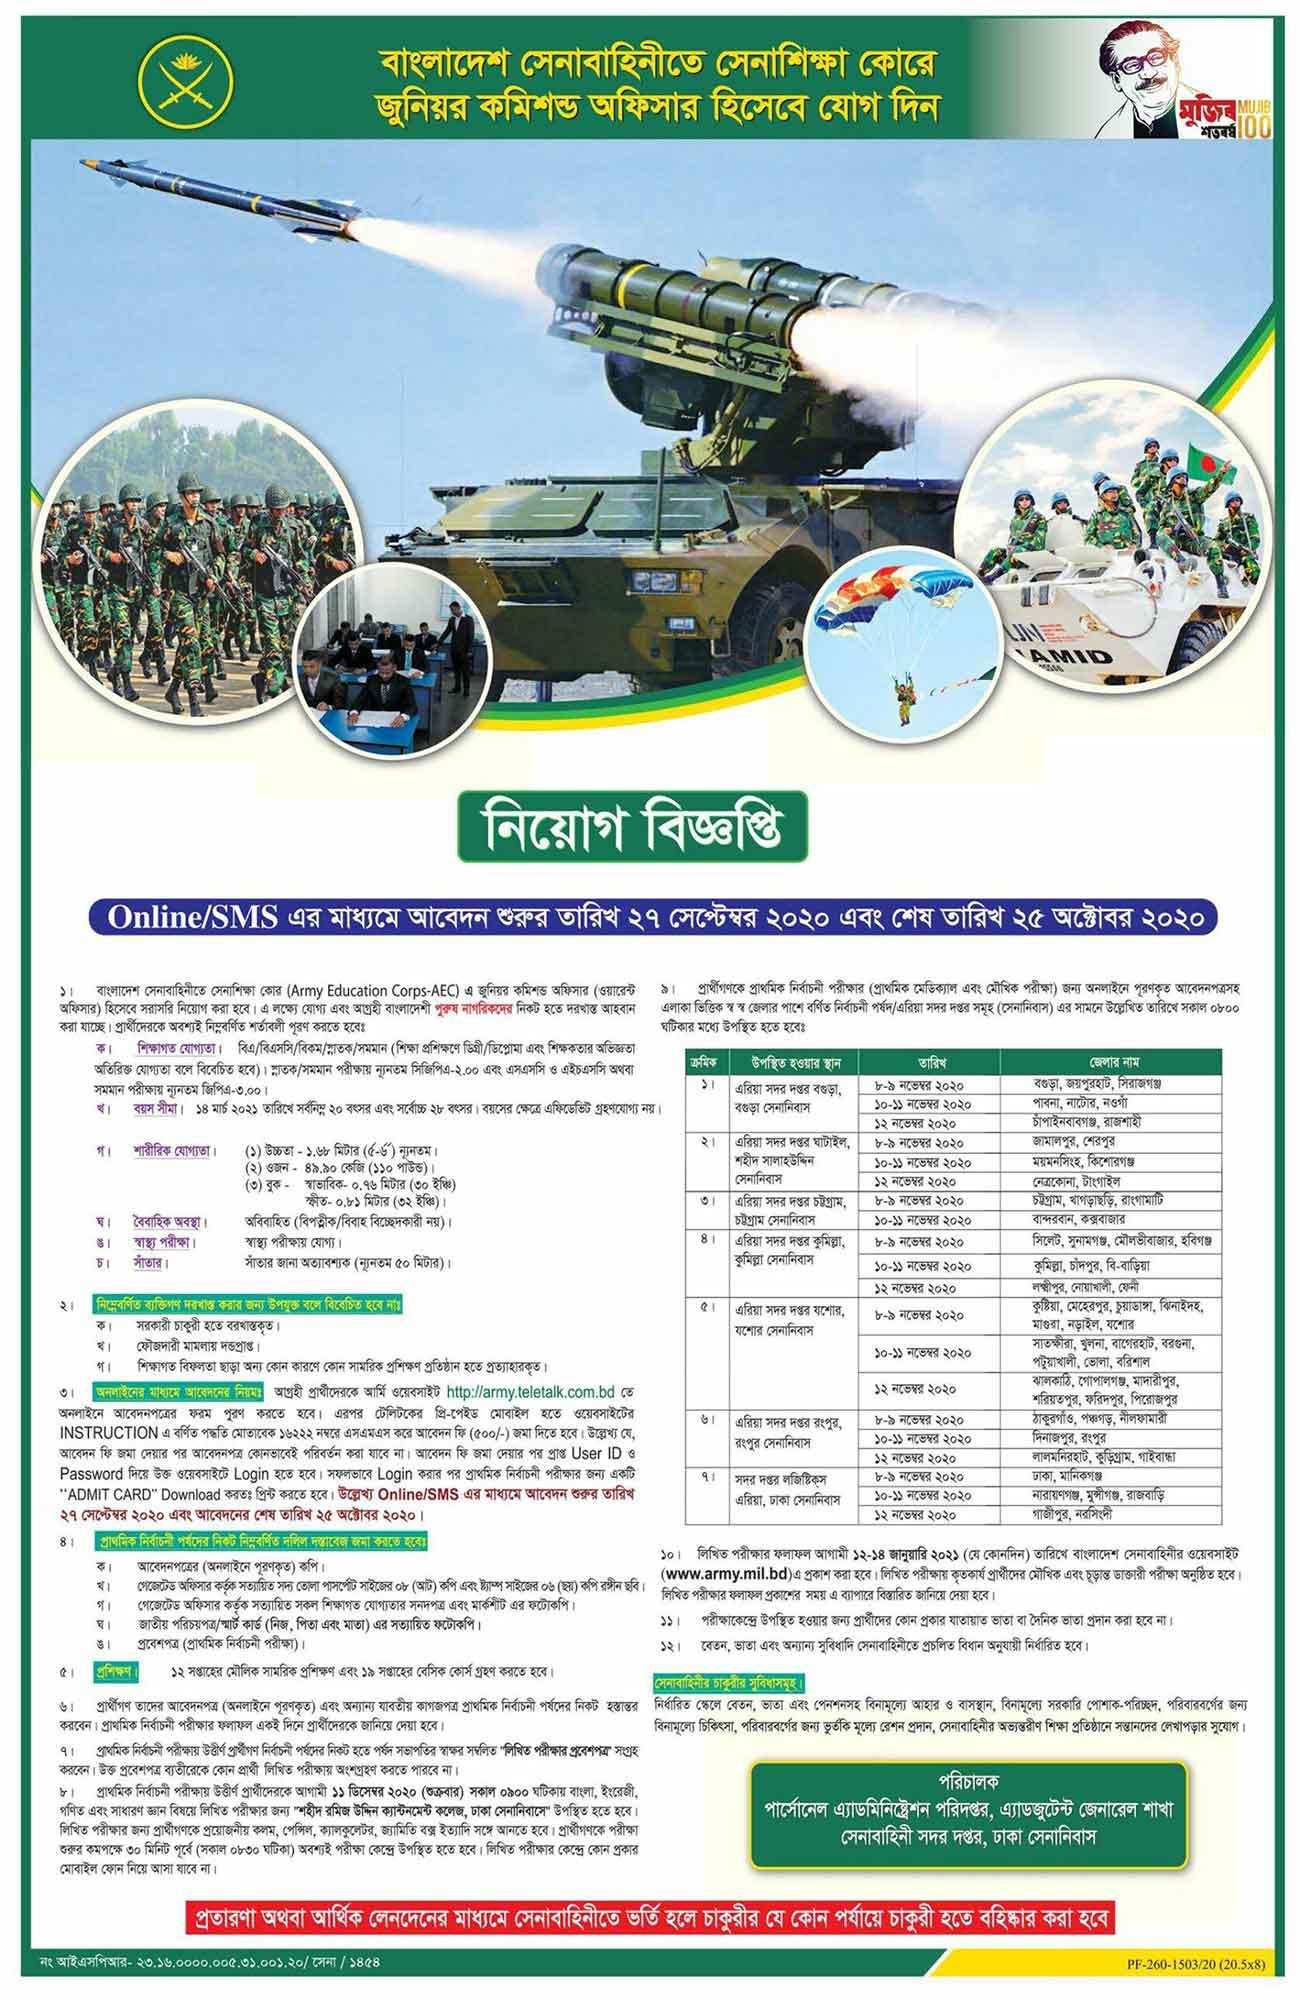 Bangladesh Army Job Circular 2020 1